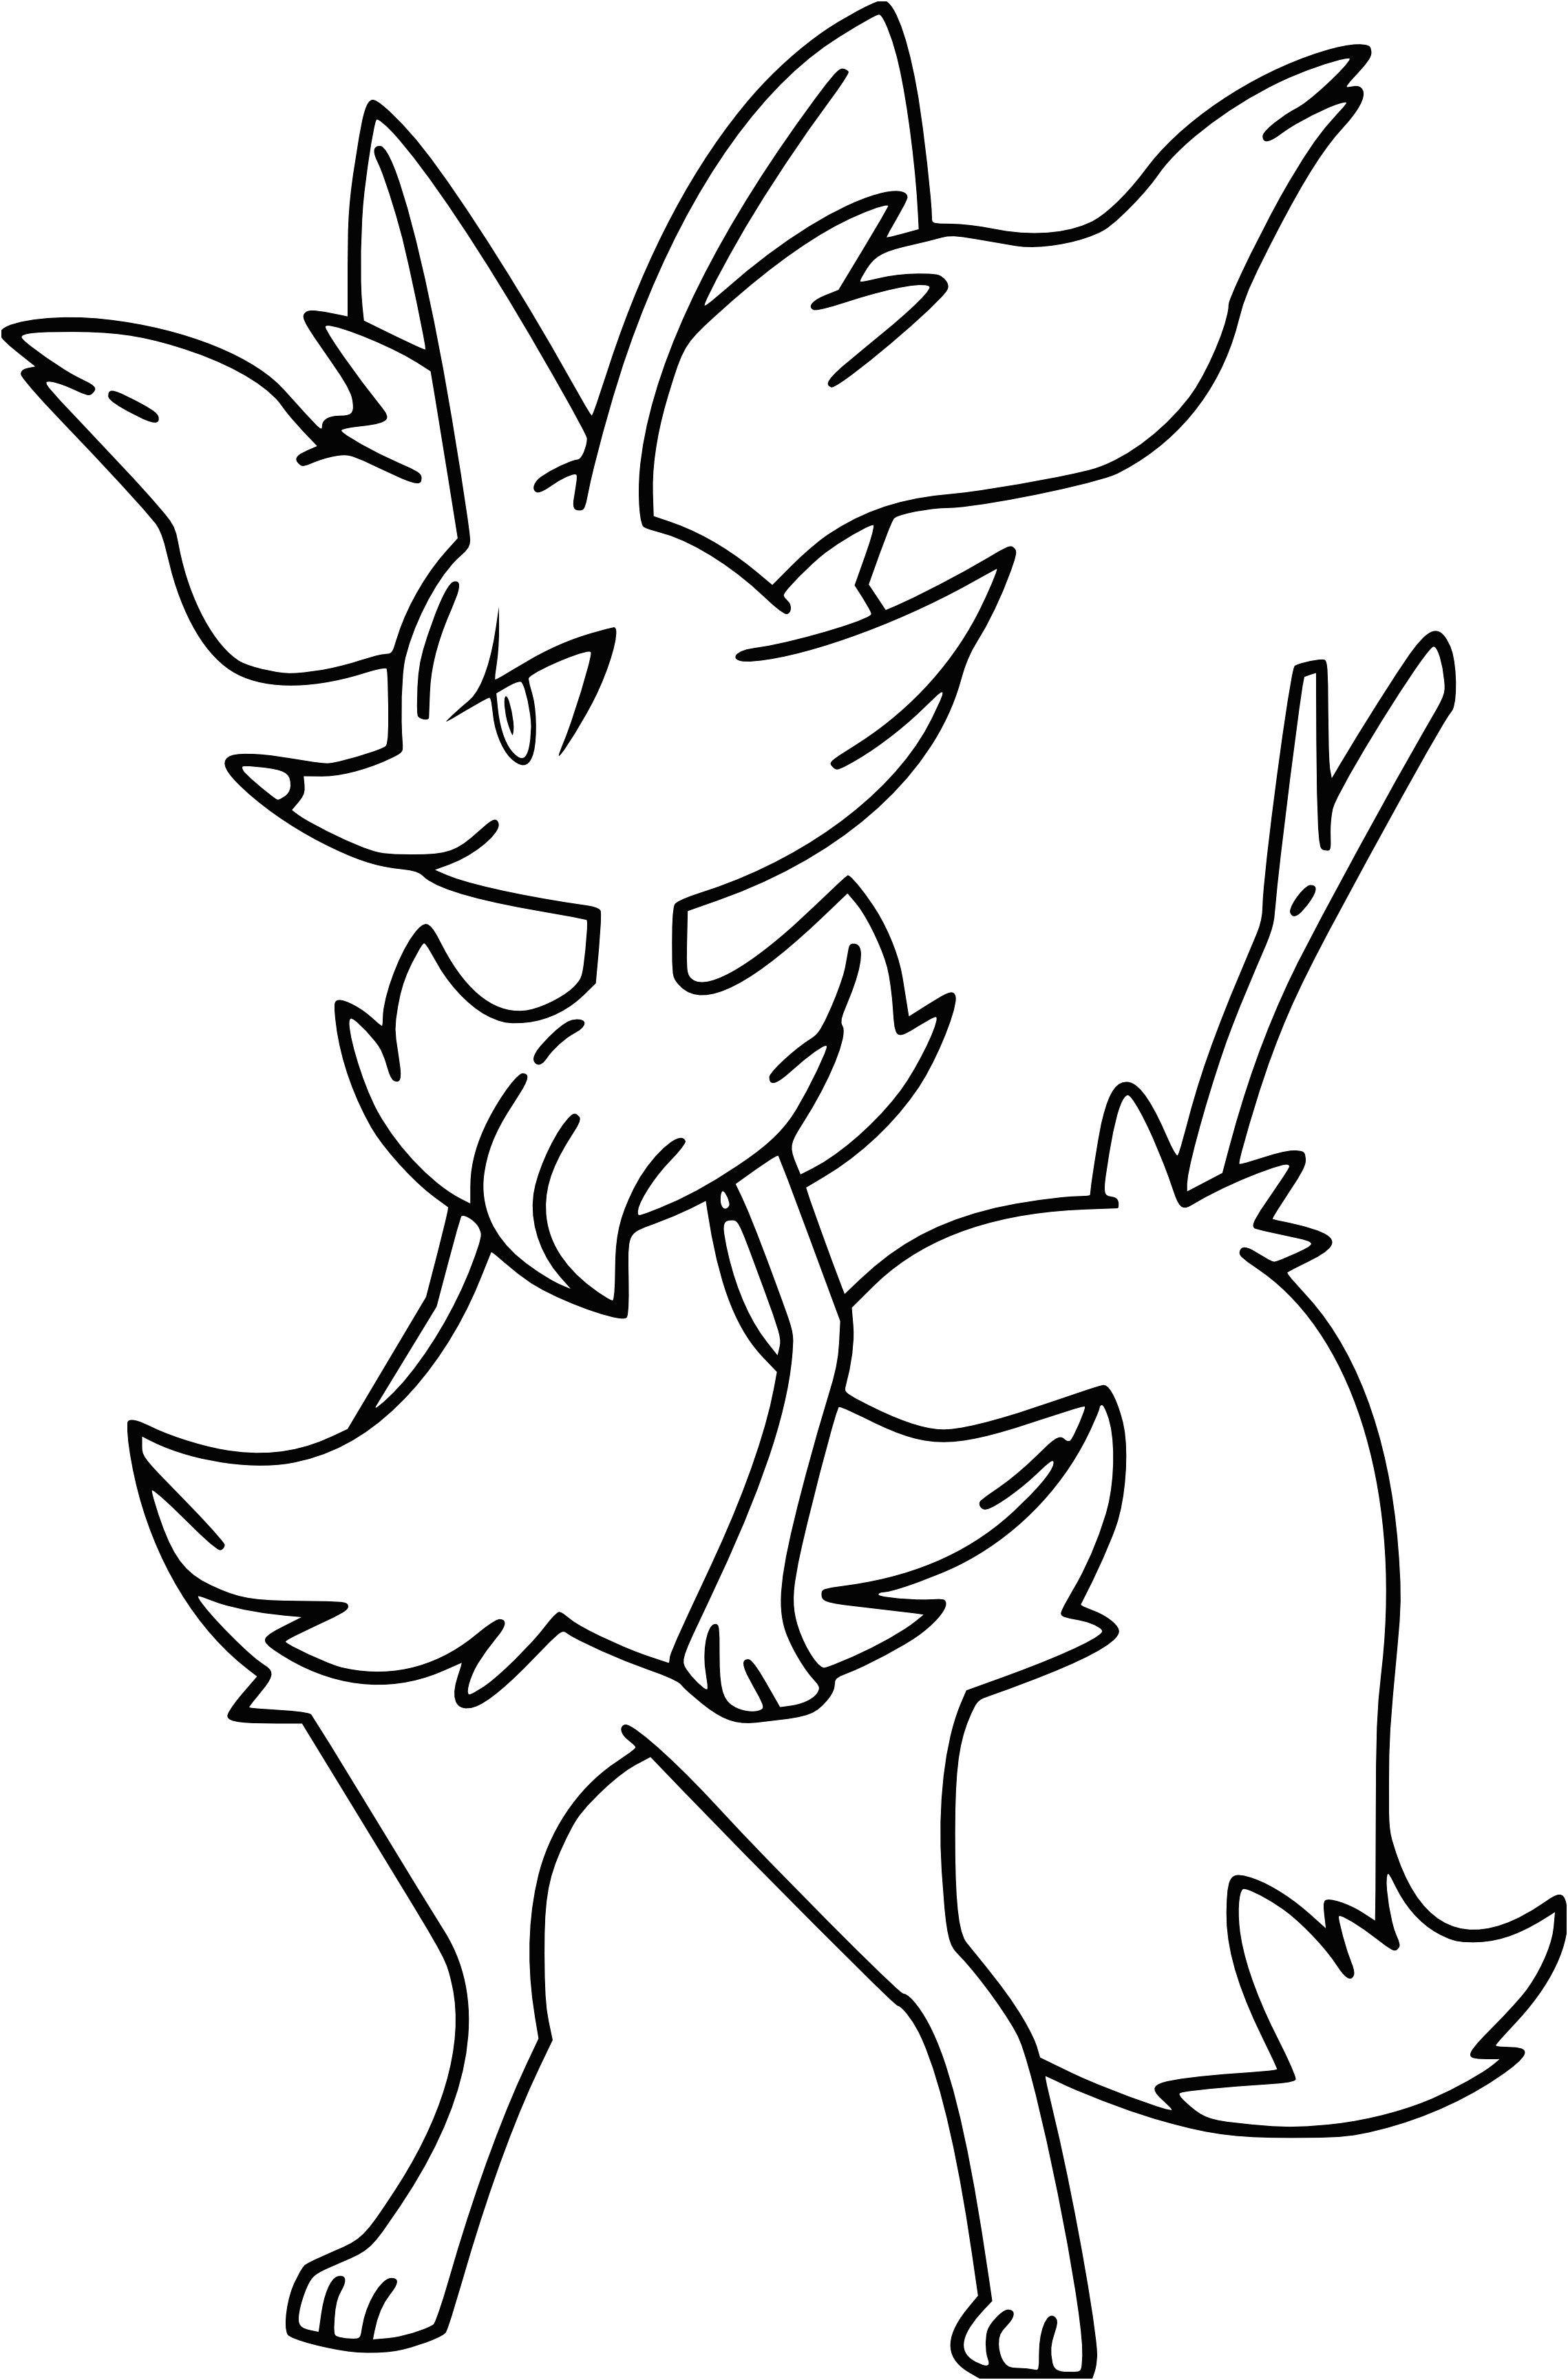 Dessin A Colorier A Imprimer Pokemon